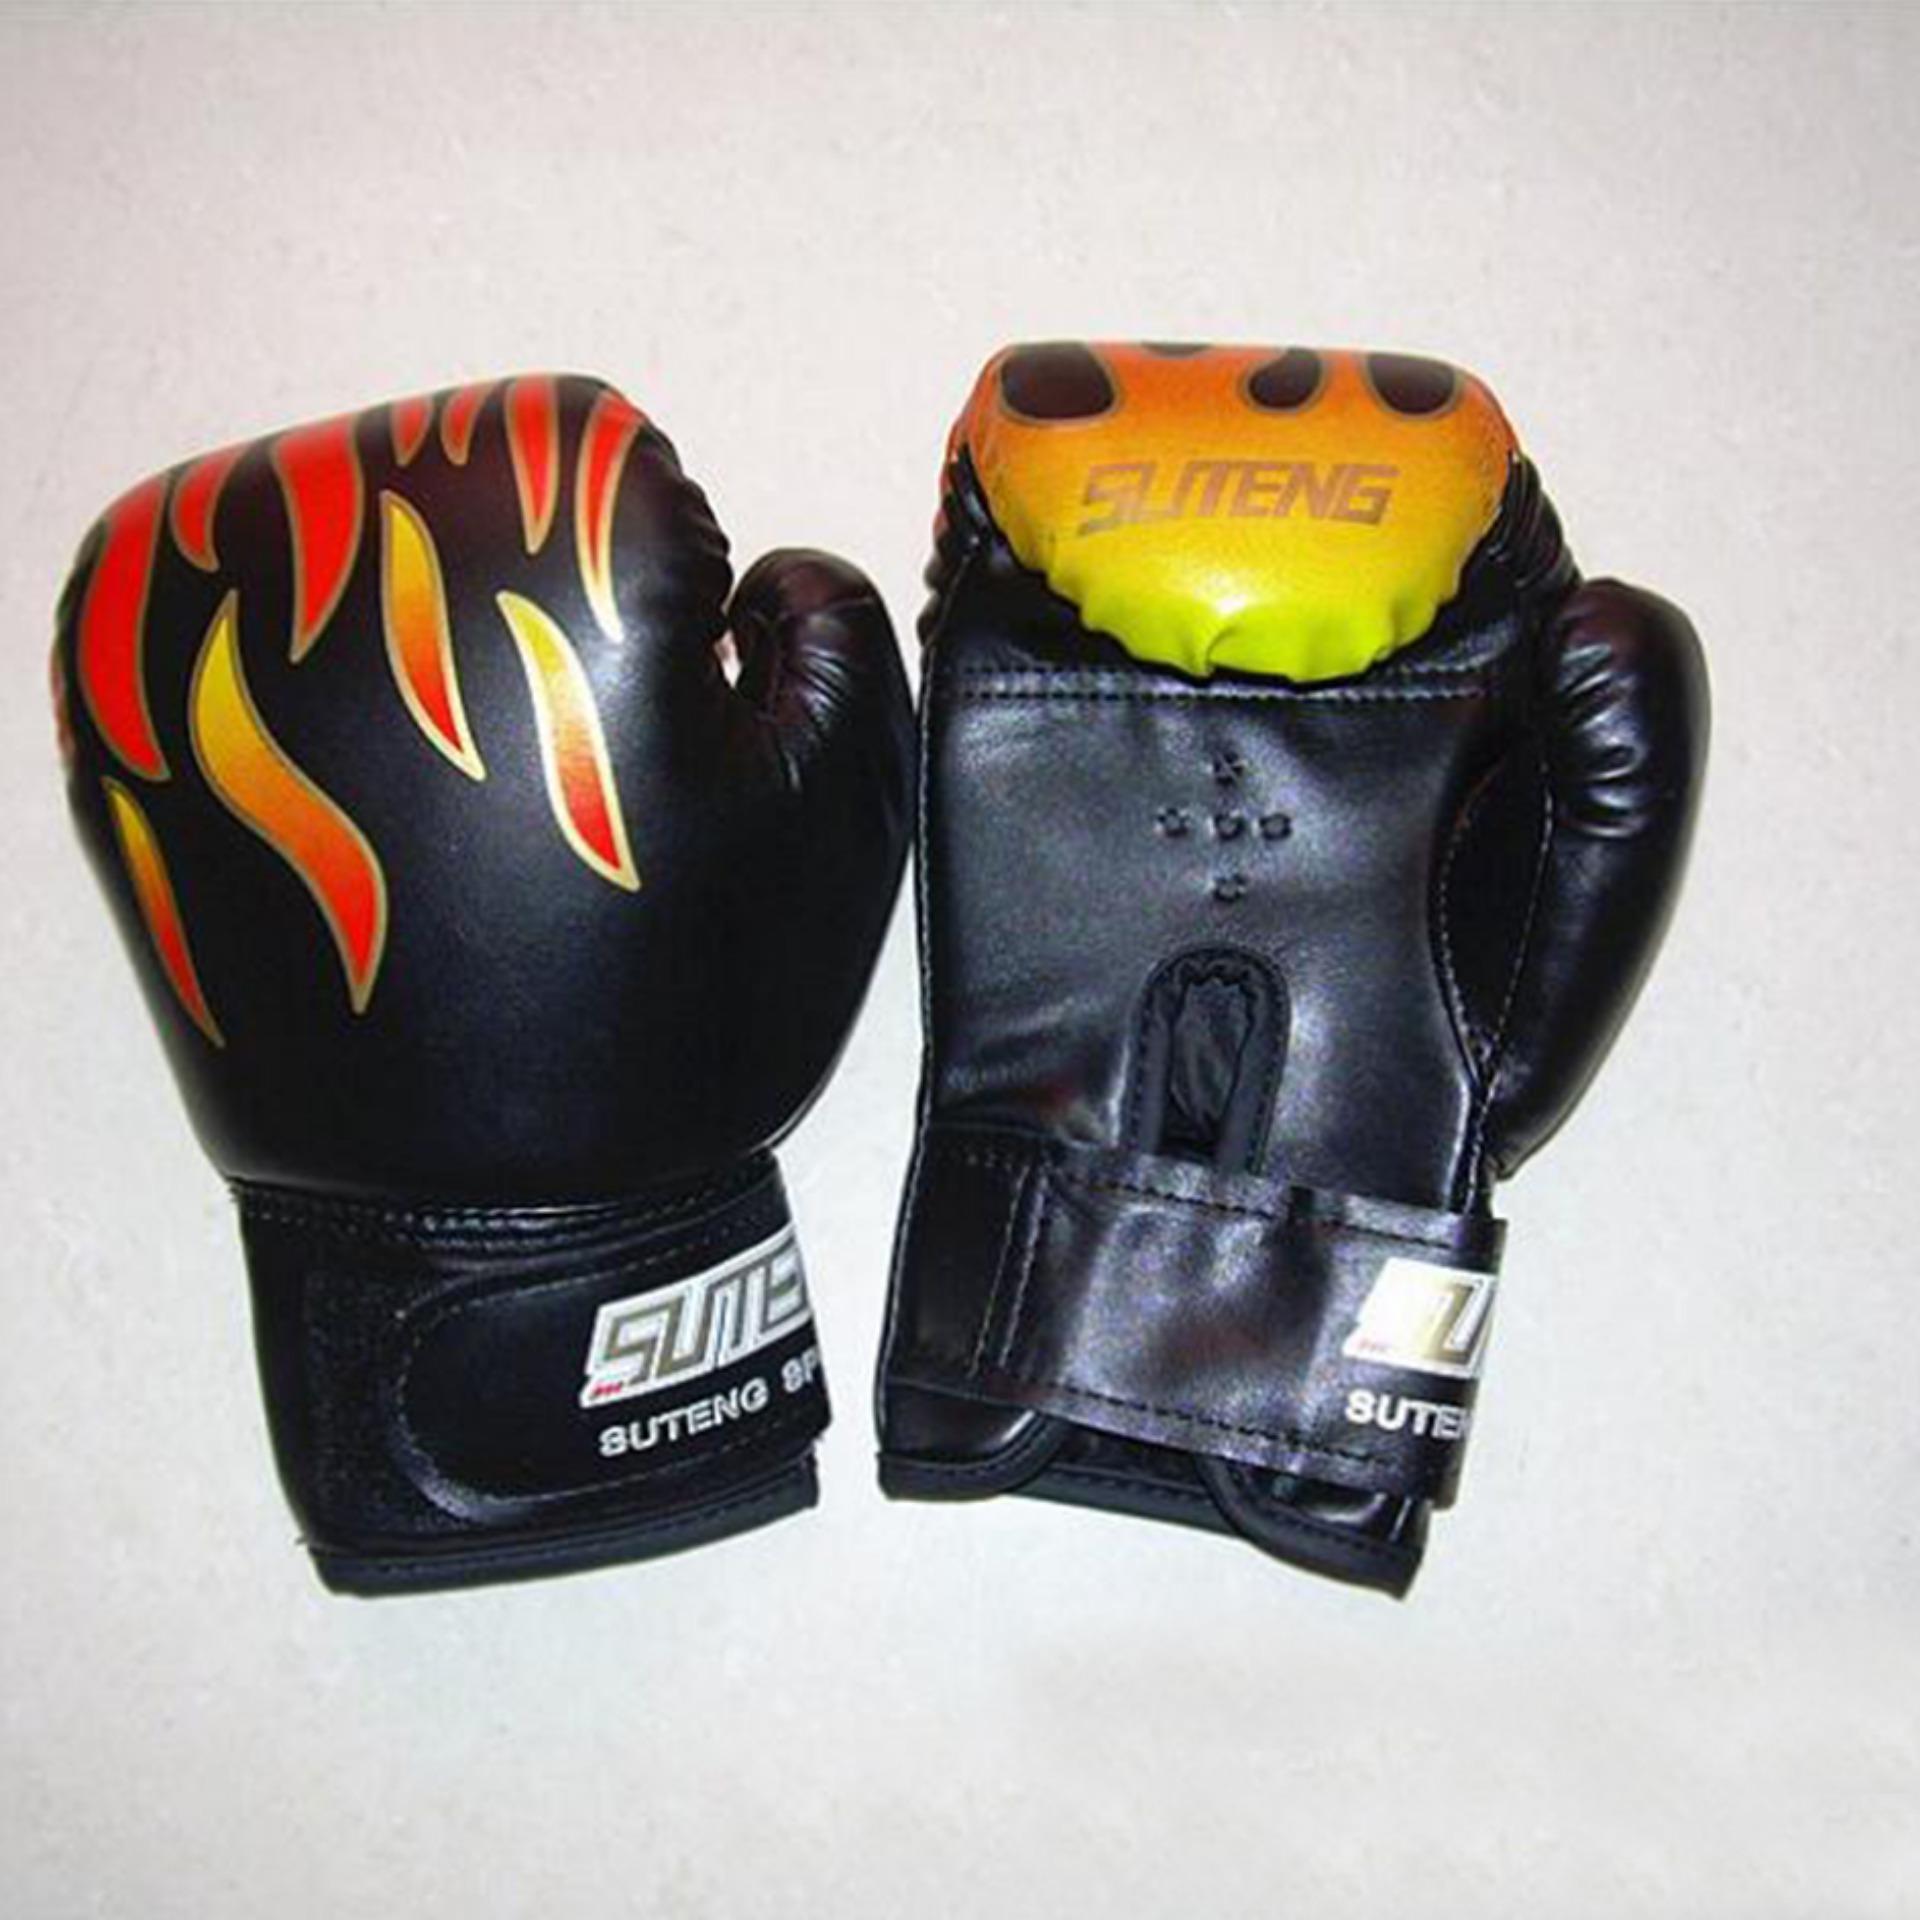 Feng Sheng Flame Children Boxing Gloves Sibling Bashing Sandbag Taekwondo Muay Thai Fight Training-Black